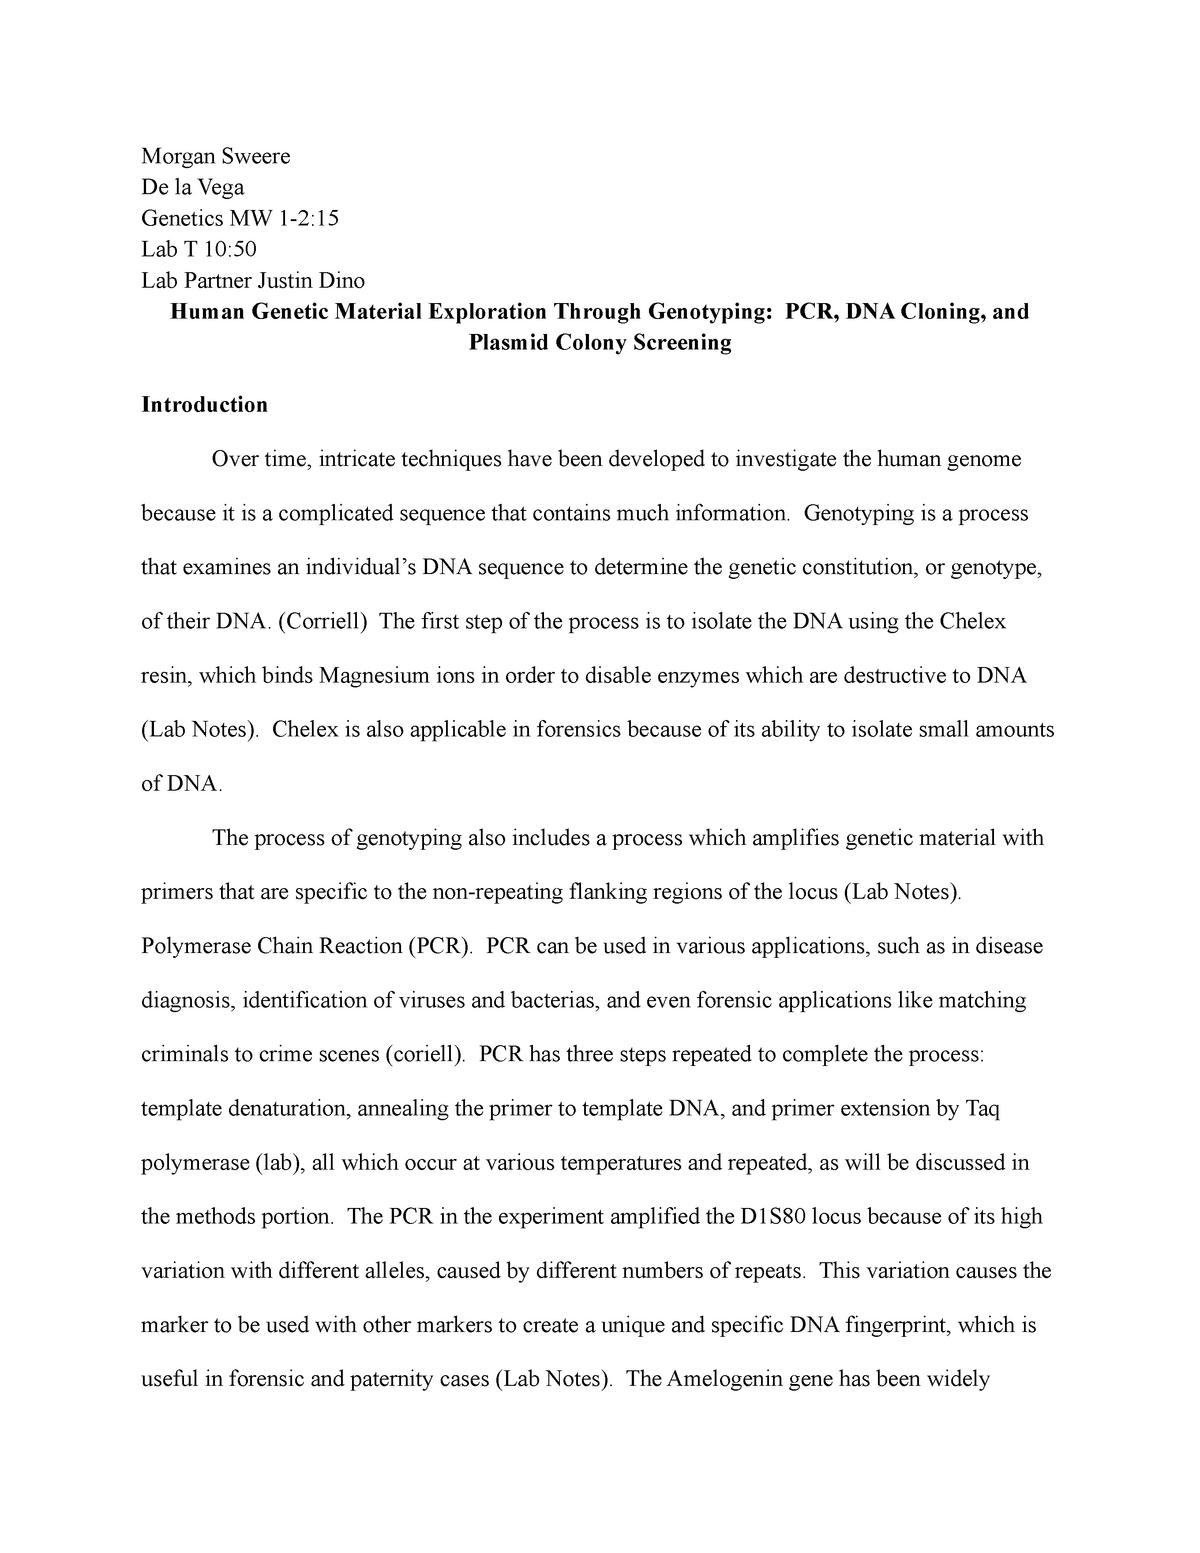 Lab Report Grade A Biol 2490 Genetics Studocu